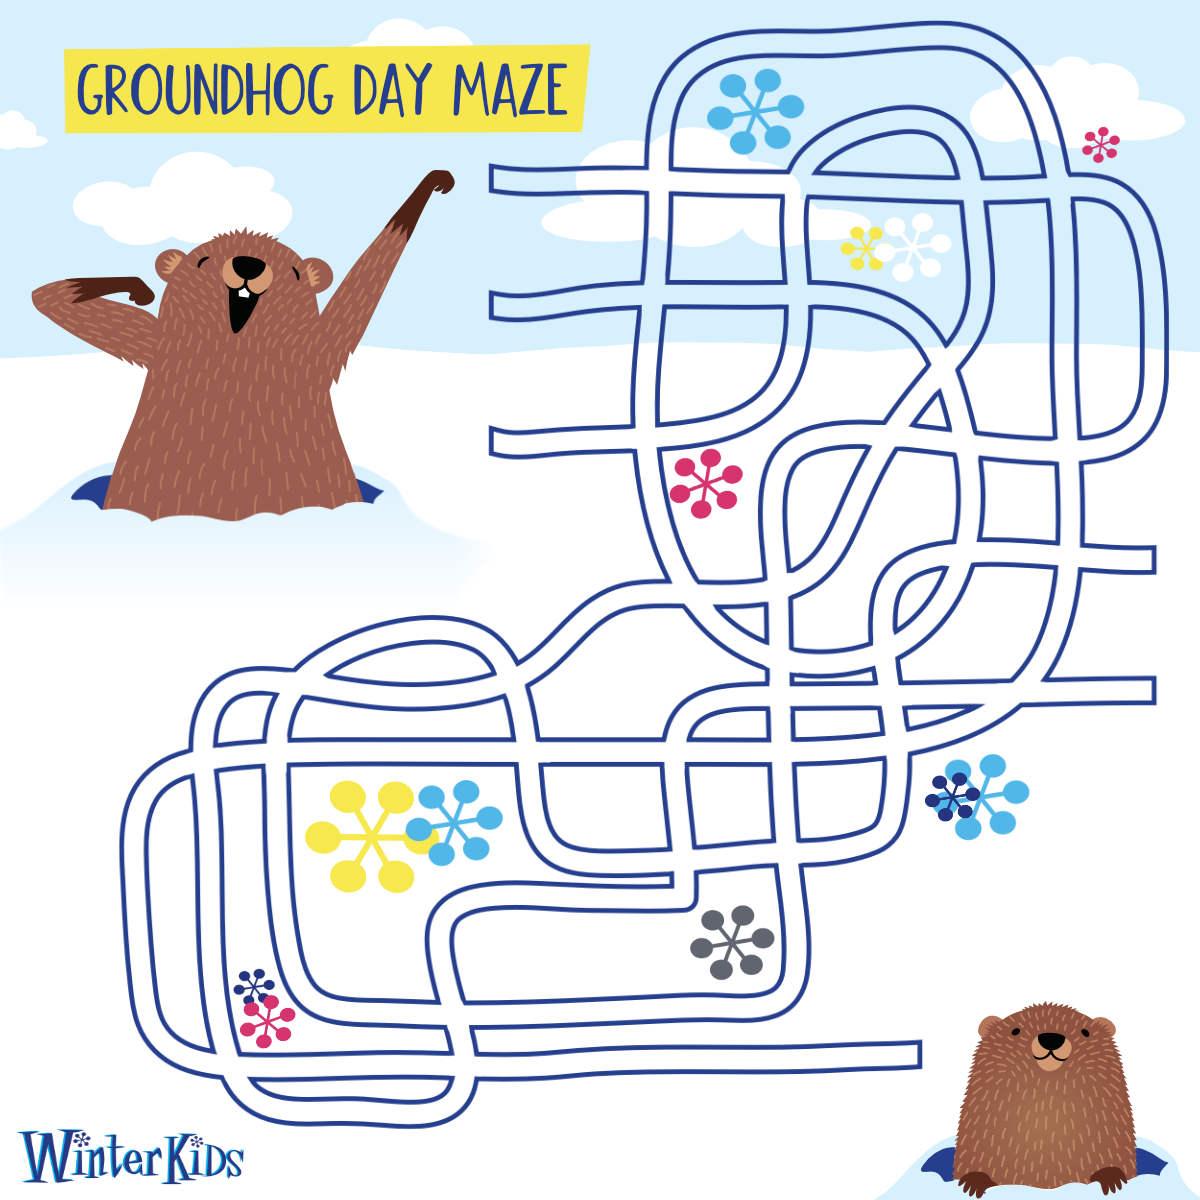 WinterKids Groundhog Day Maze BLOG IMAGE REV